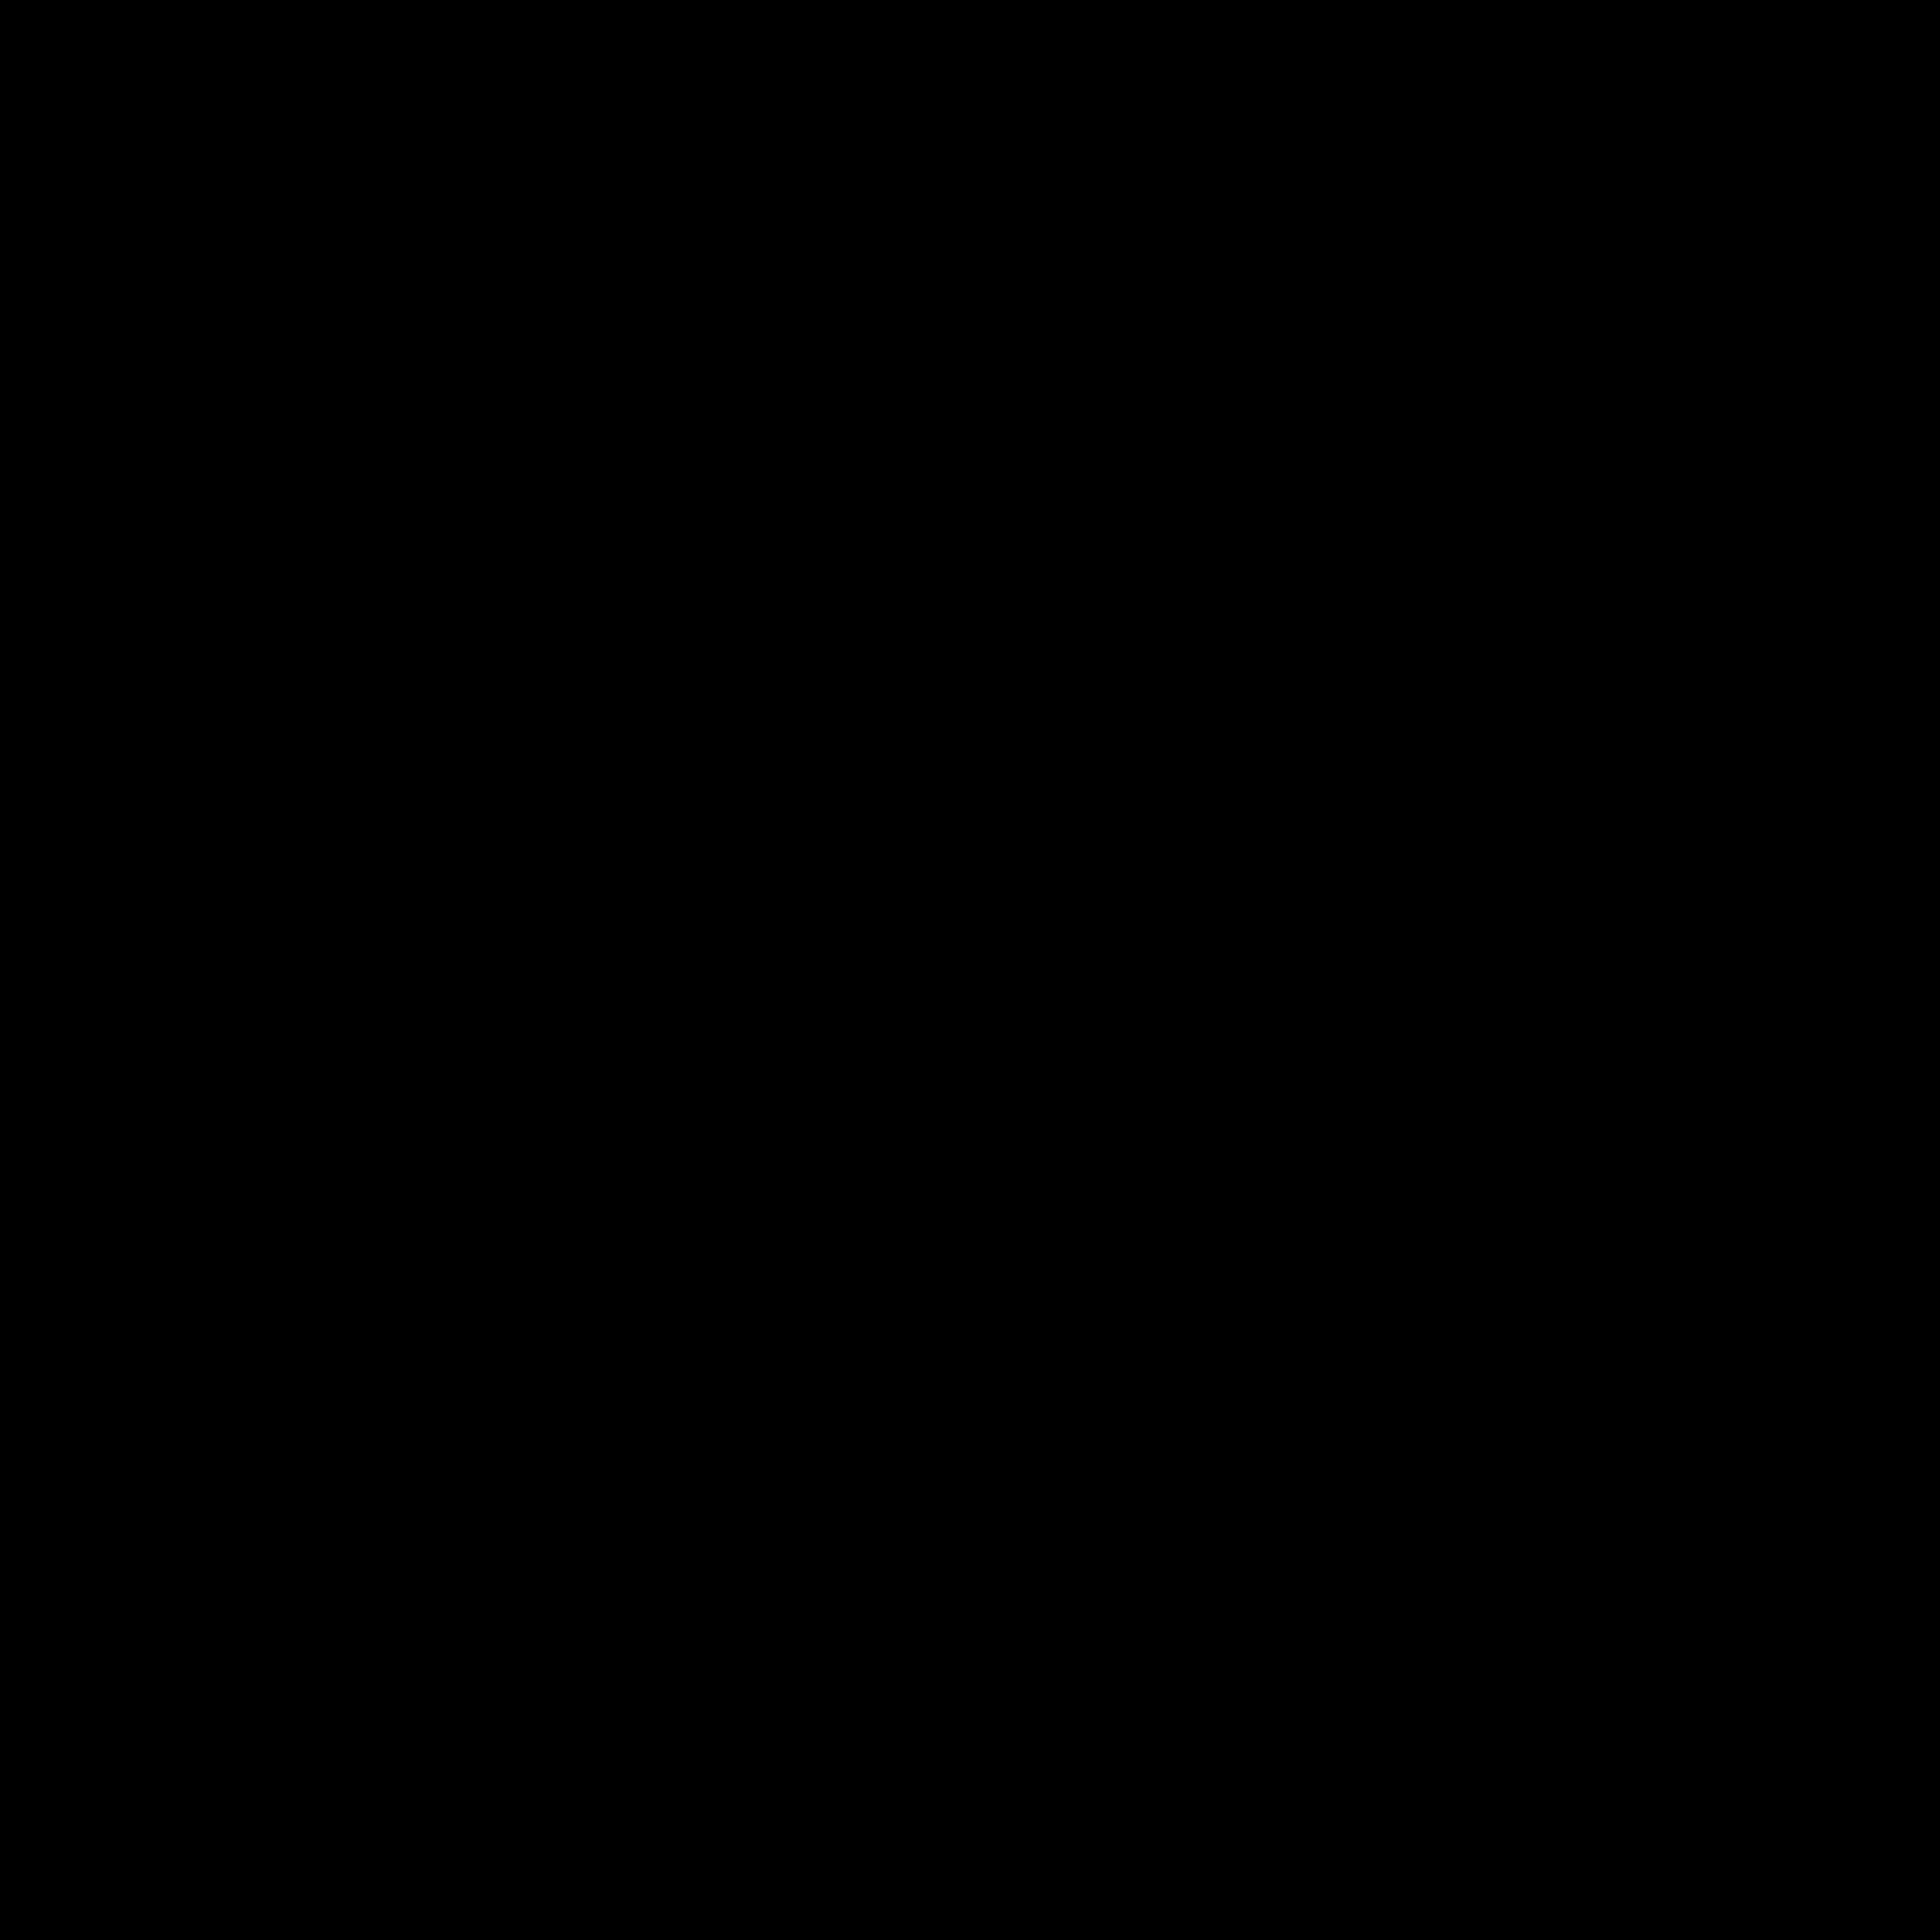 Naklejka na ścianę broda gentelman 2